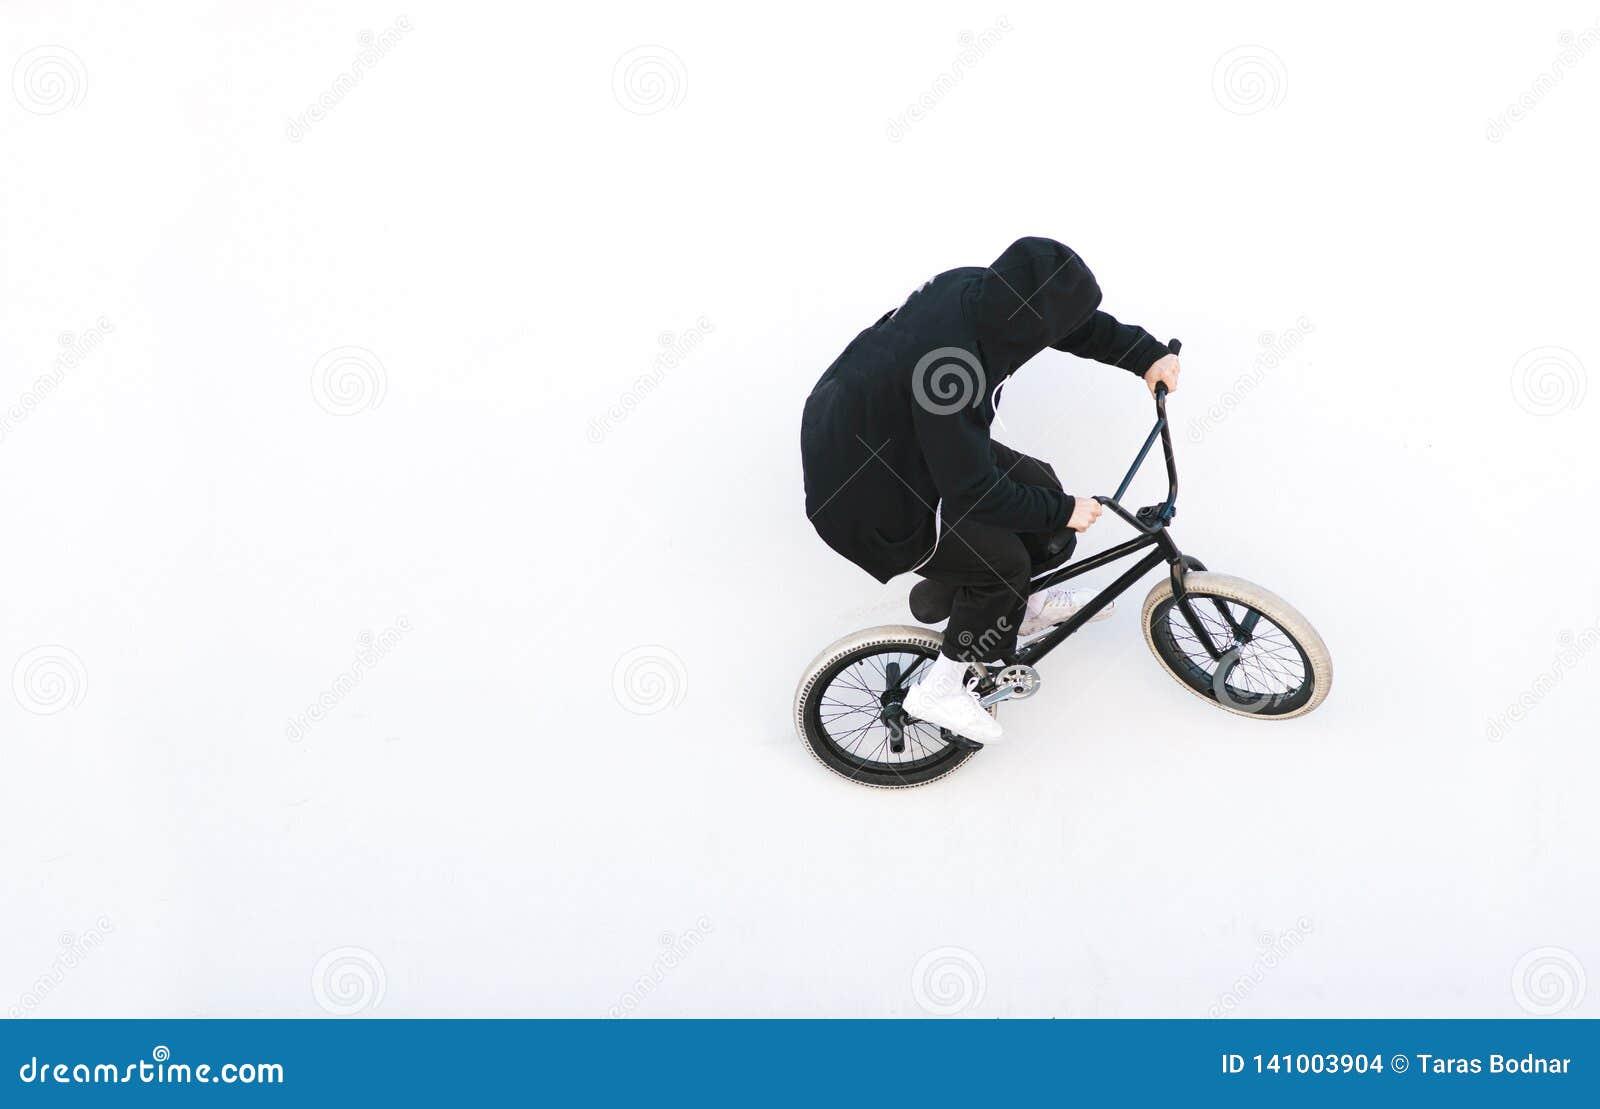 Bmx cyclist in dark clothes rides on a white background. Bike rider on bmx bike isolated on white background